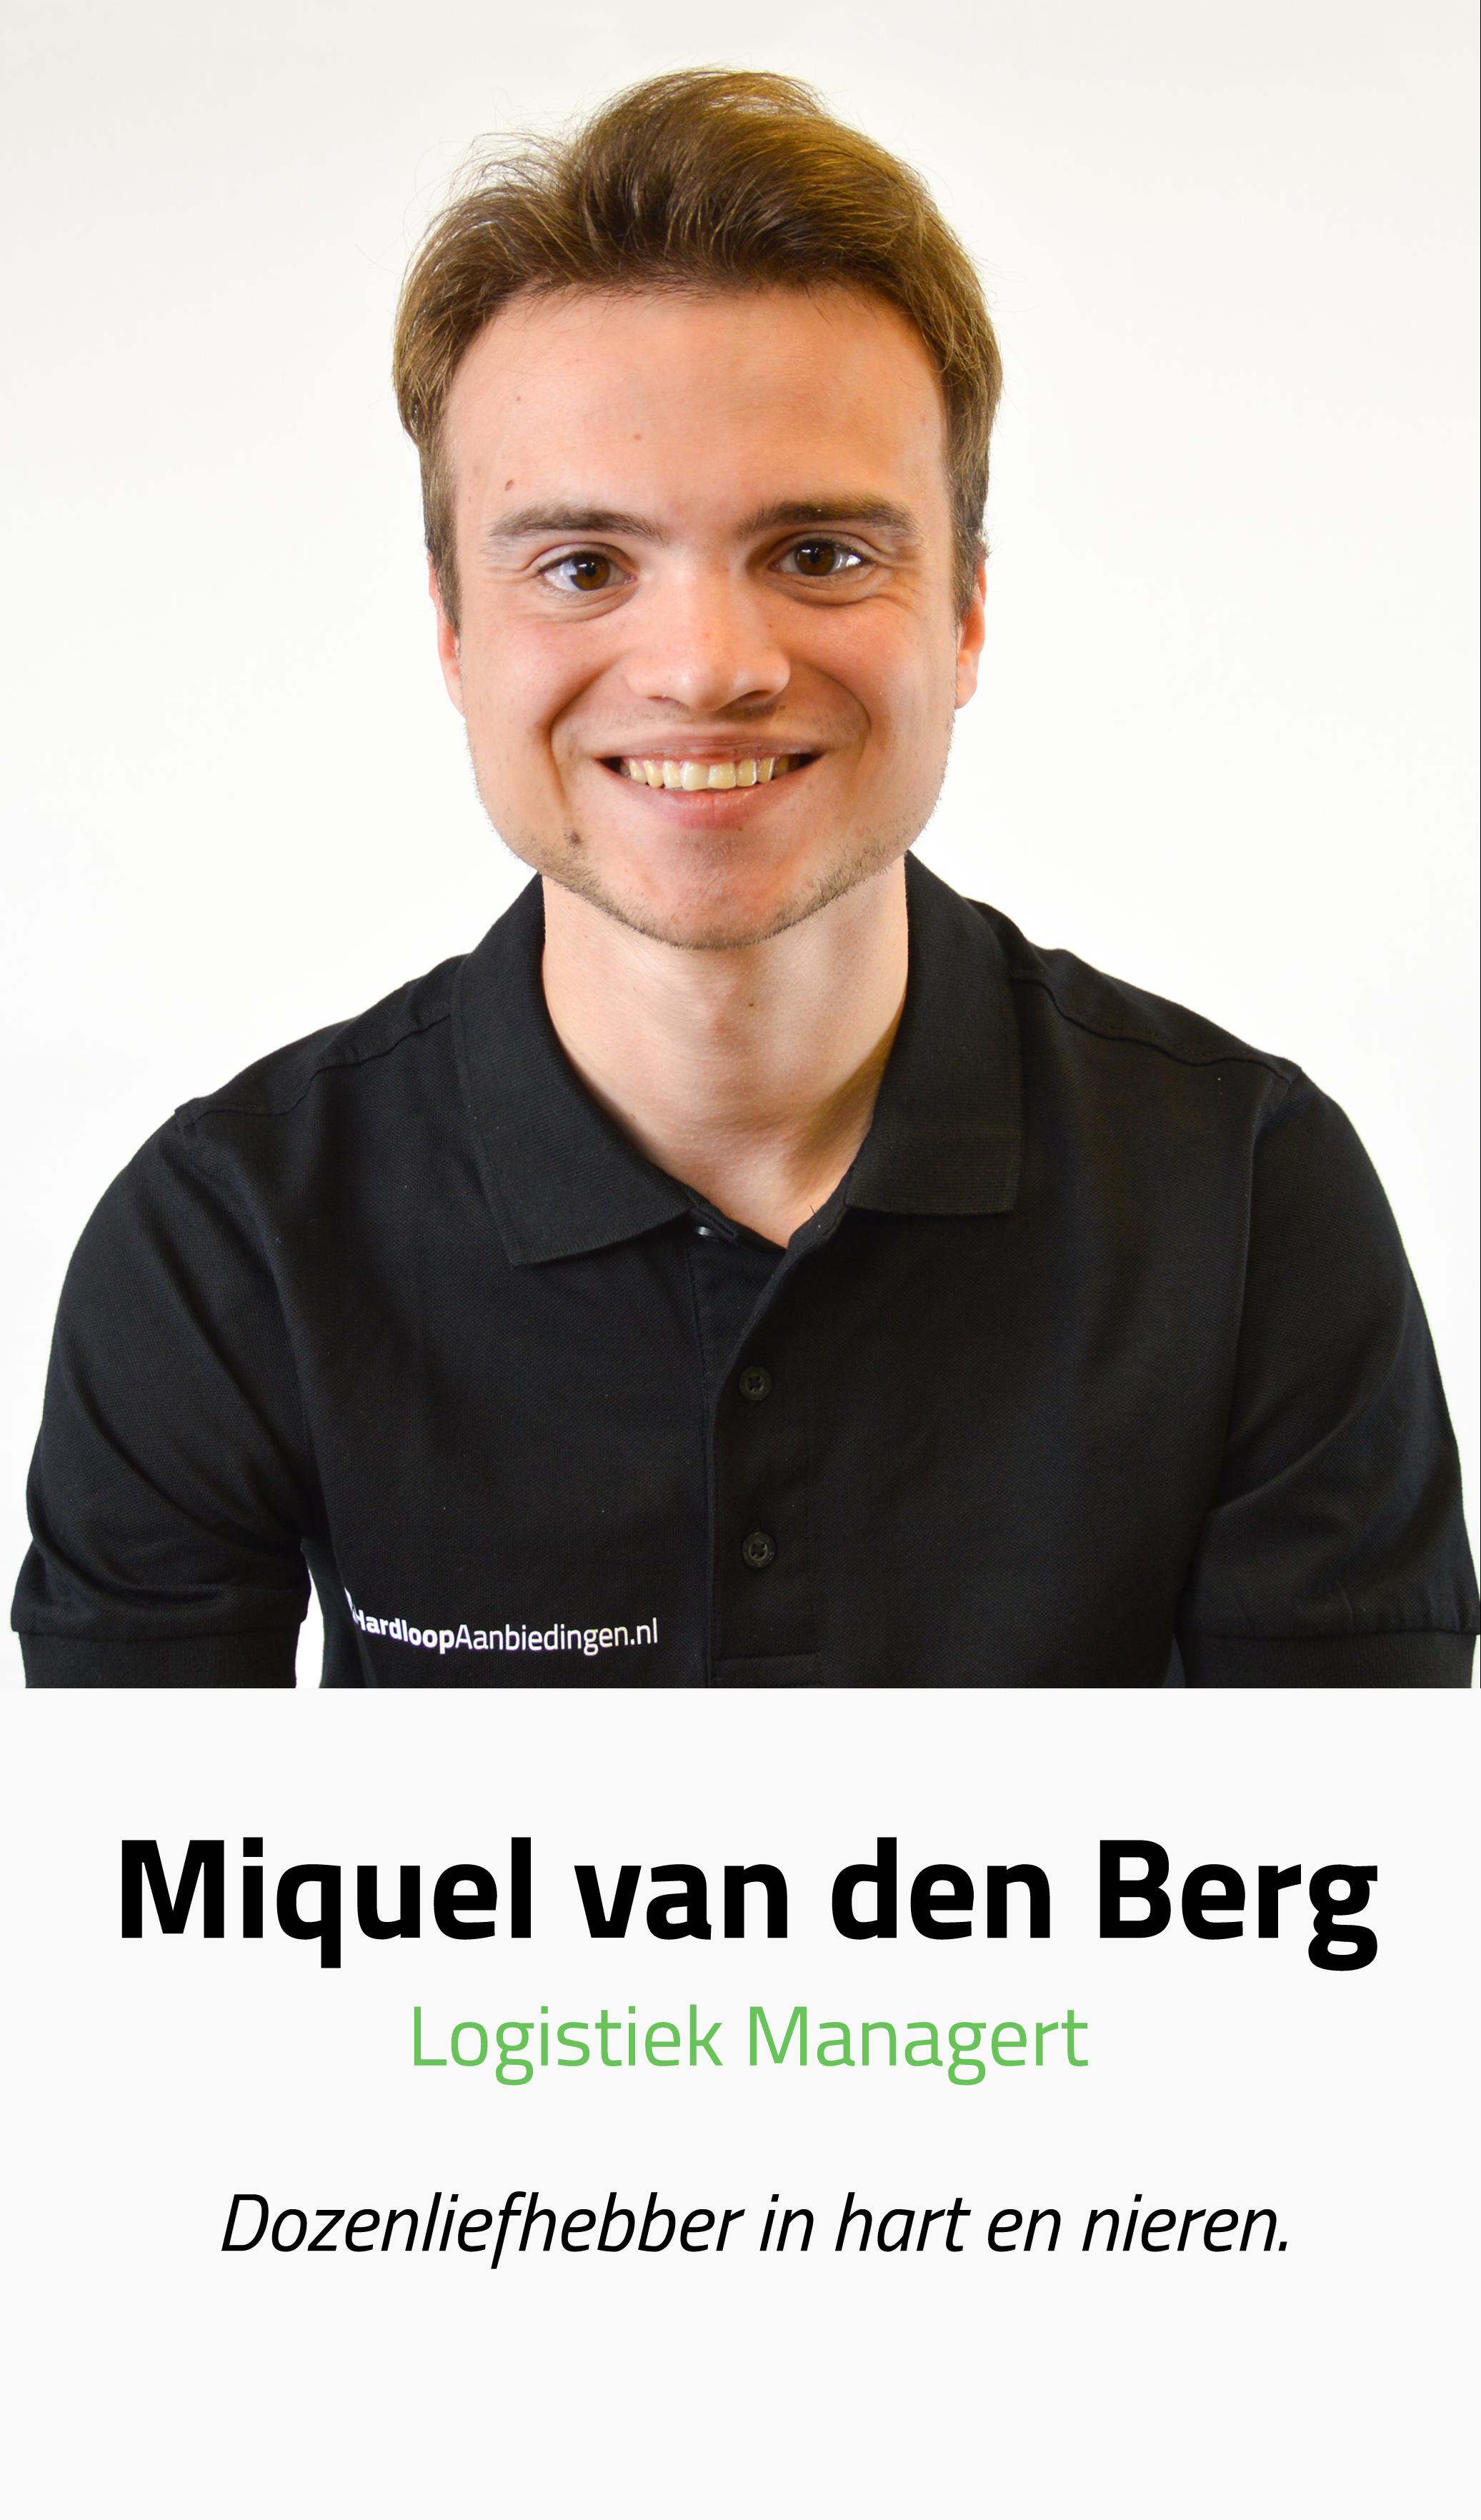 Miquel | Hardloopaanbiedingen.nl